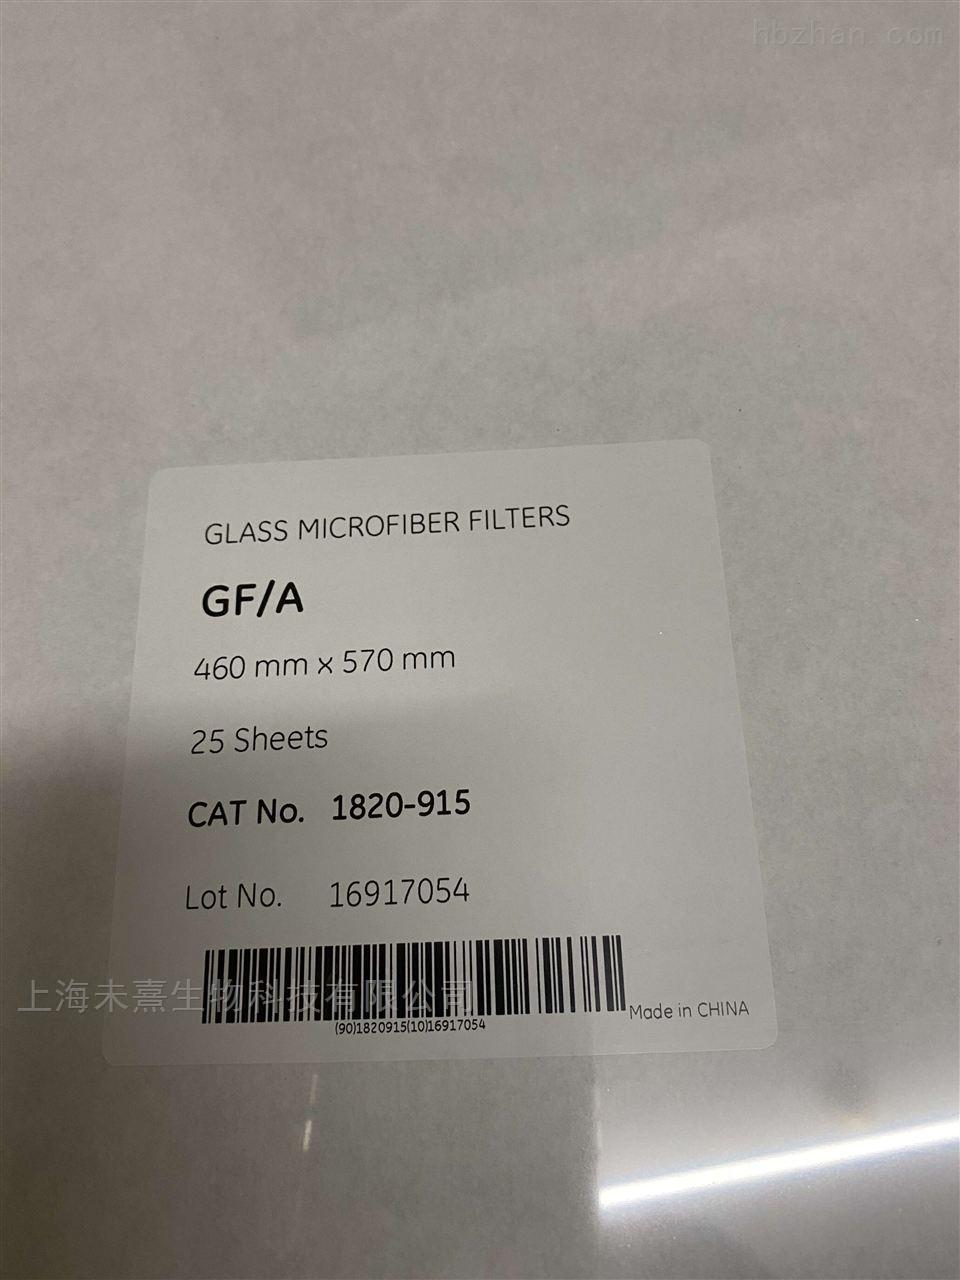 WHATMAN沃特曼GF/A玻璃纤维滤纸460*570mm